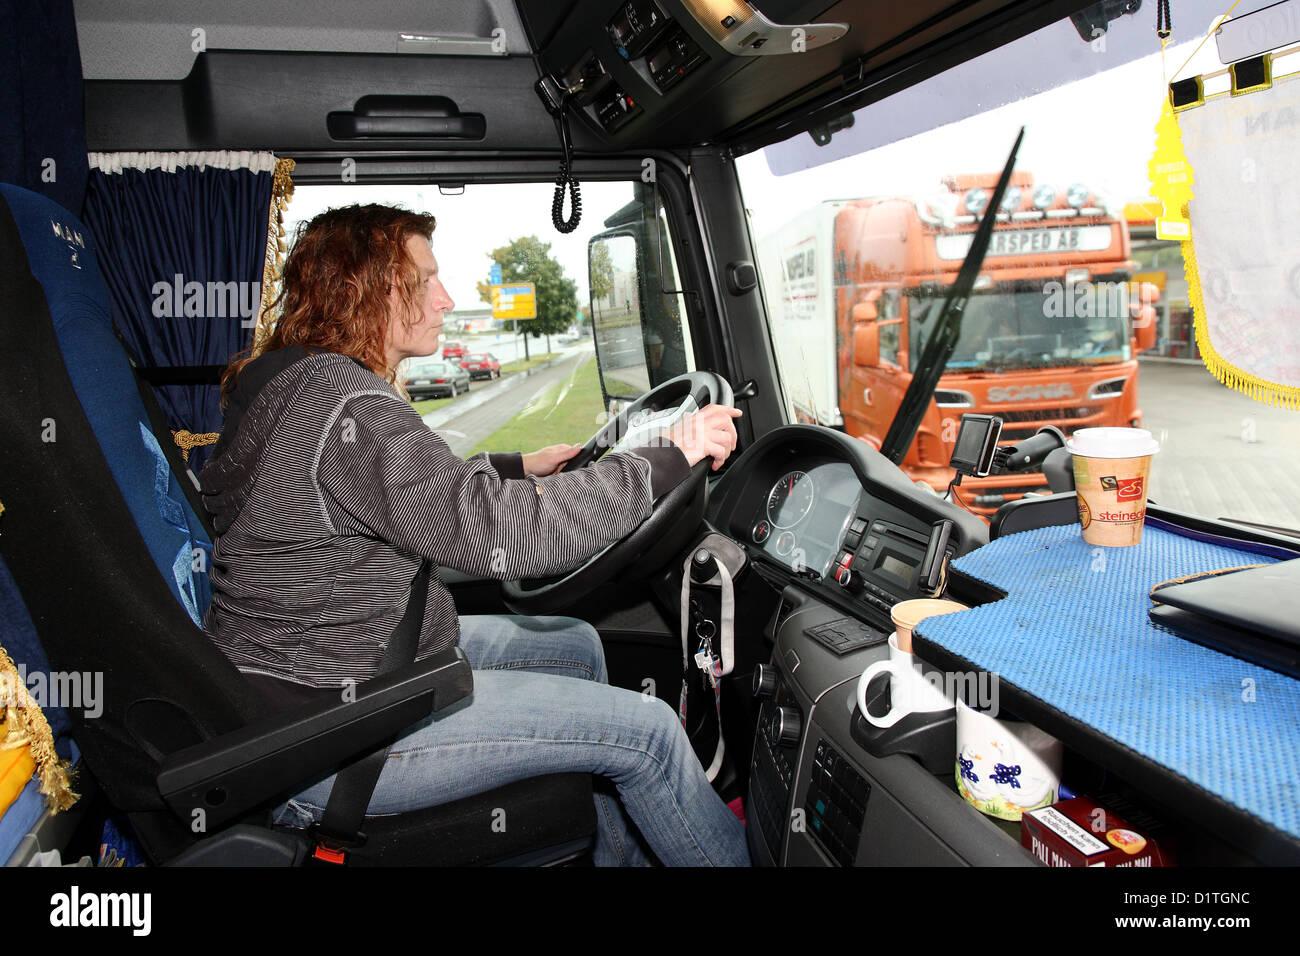 Braunschweig, Germany, trucker Inge meadow behind their truck tax - Stock Image